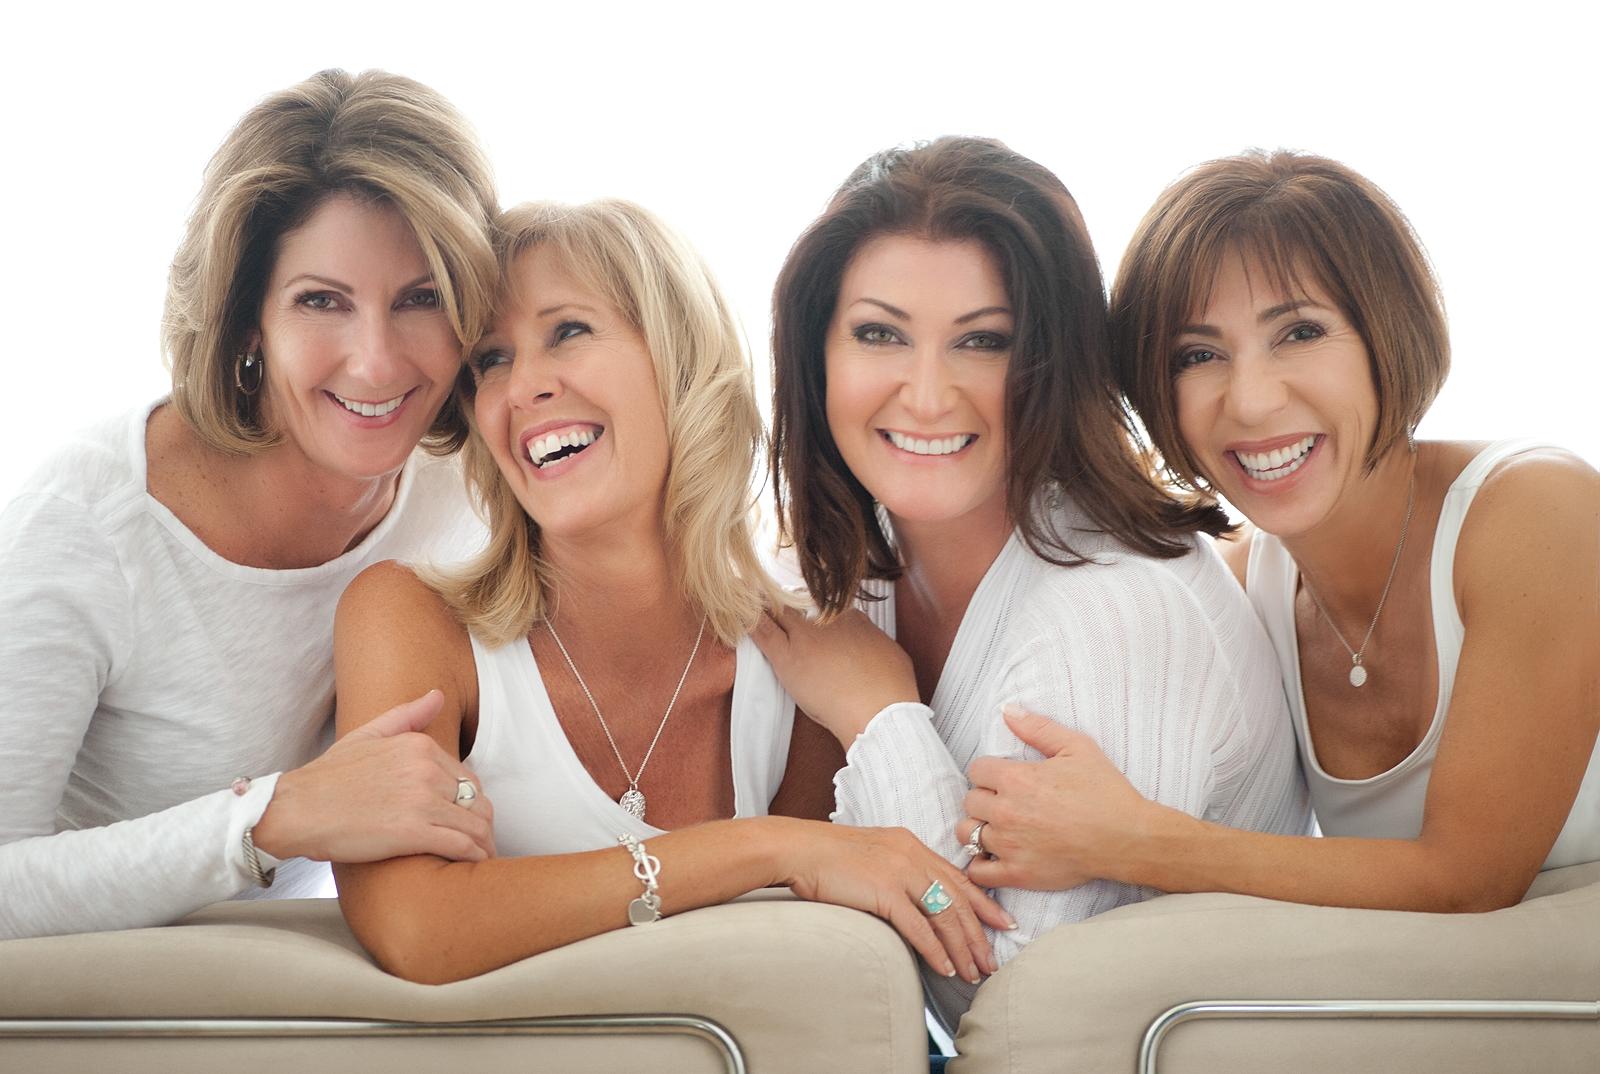 25-women-group-team-portrait-laughing.jpg